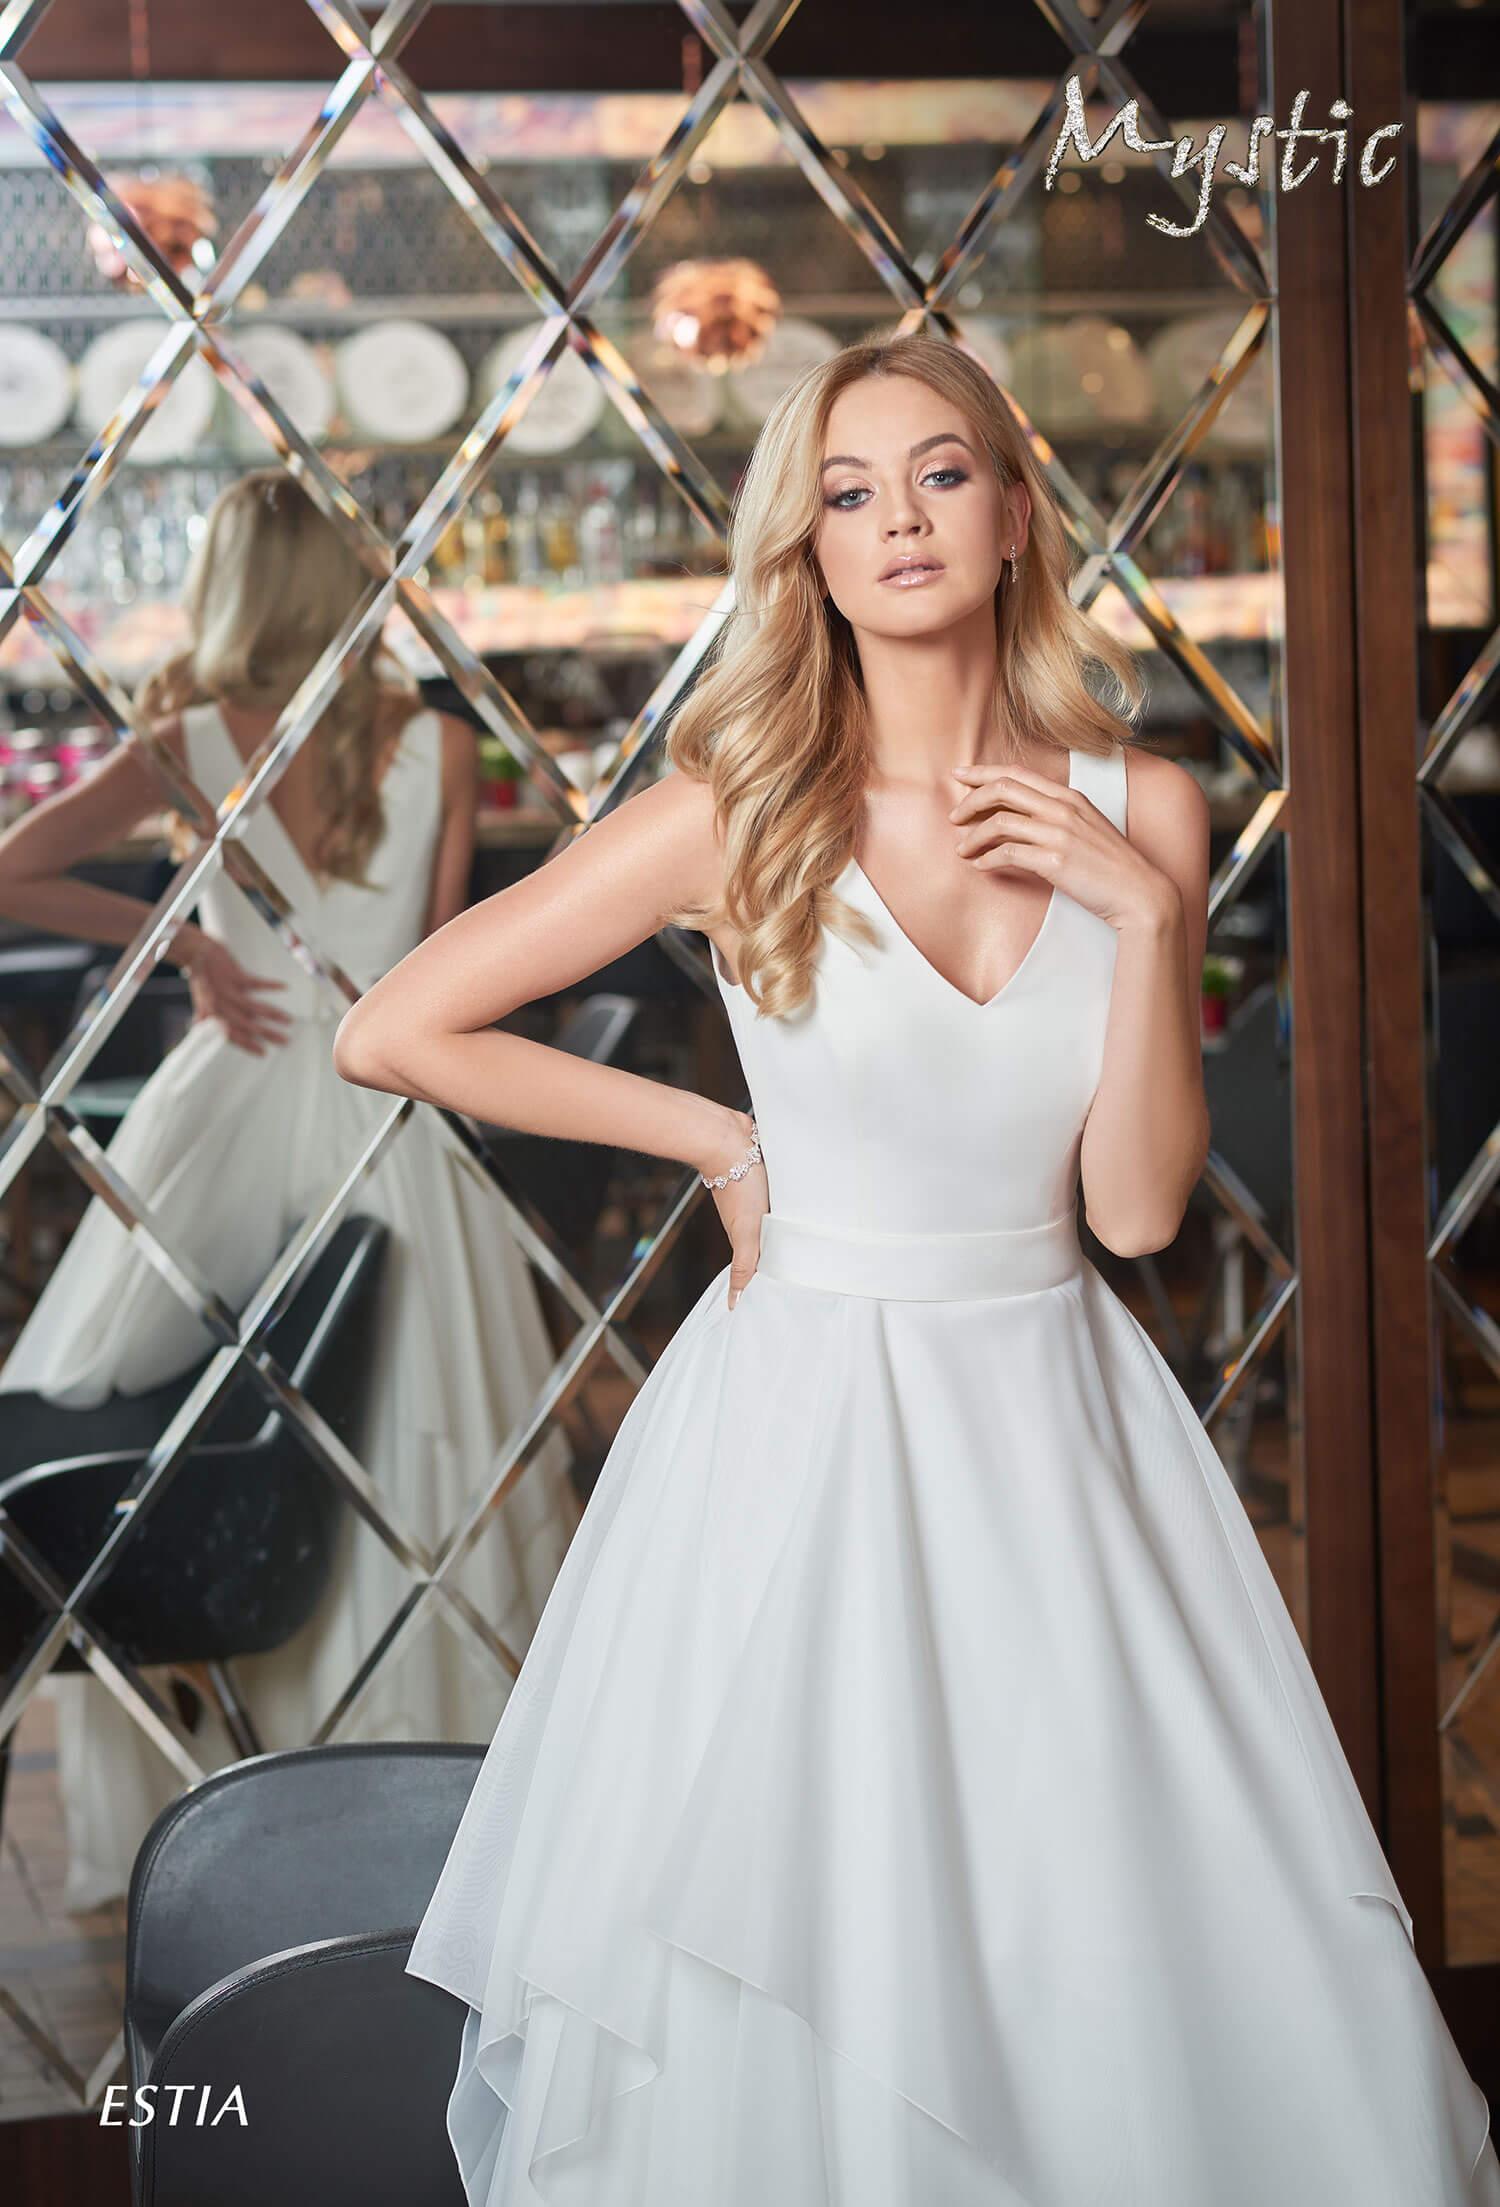 cdcc83e1b3 Mystic Bridal - producent i projektant sukien ślubnych